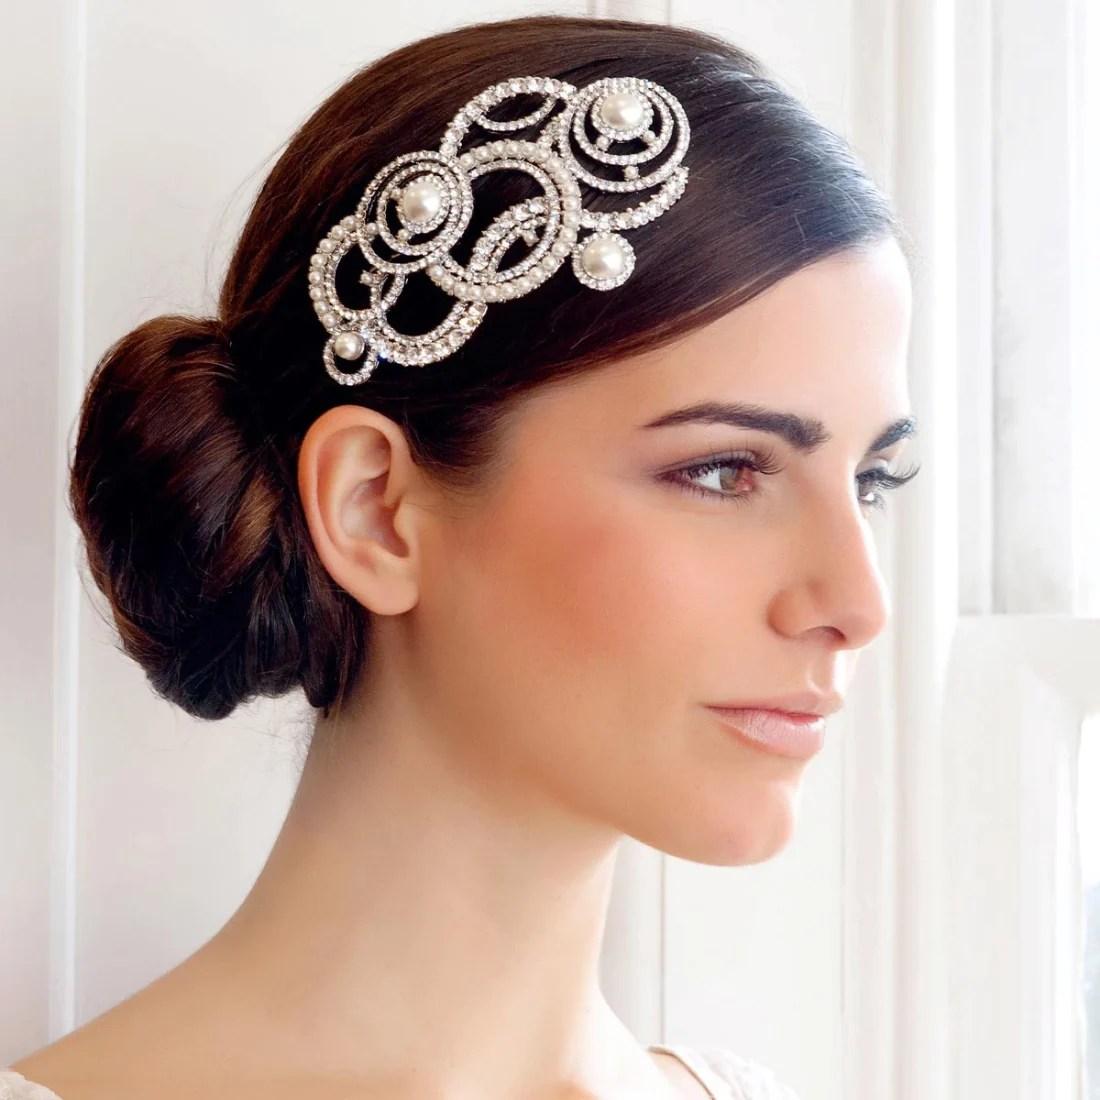 Divine In Art Deco Headpiece Hair Accessories Glitzy